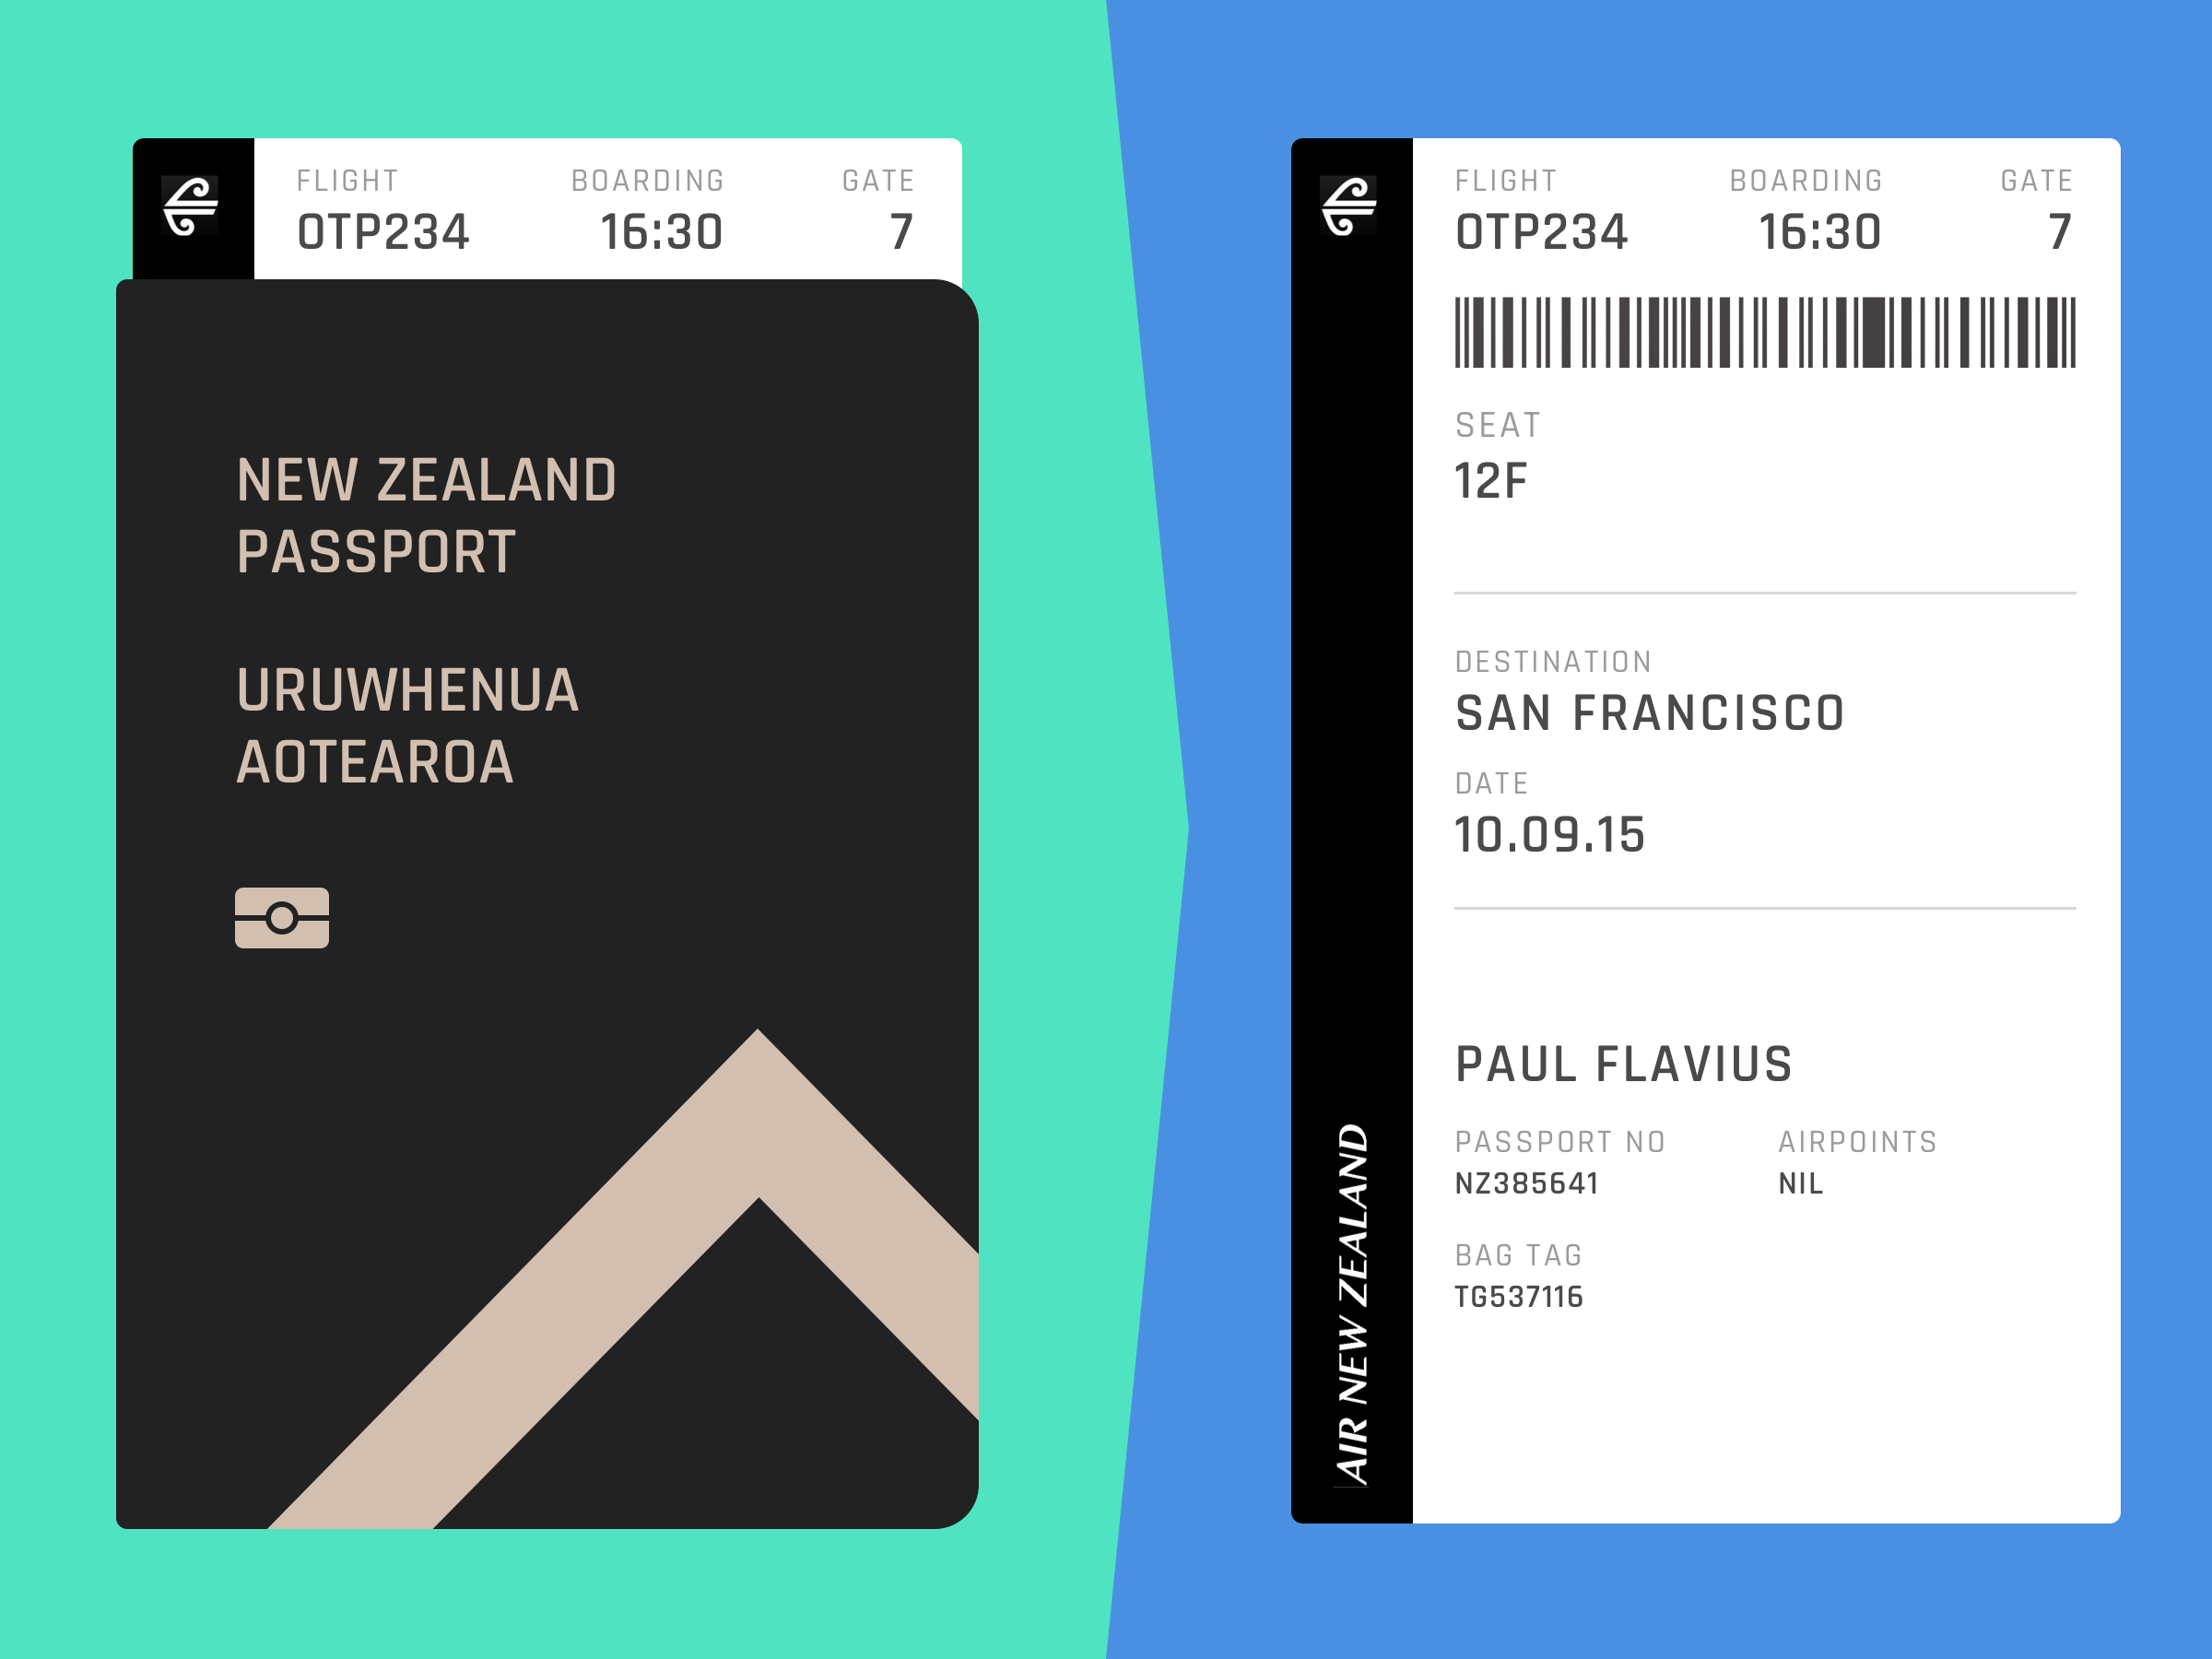 Boarding pass full